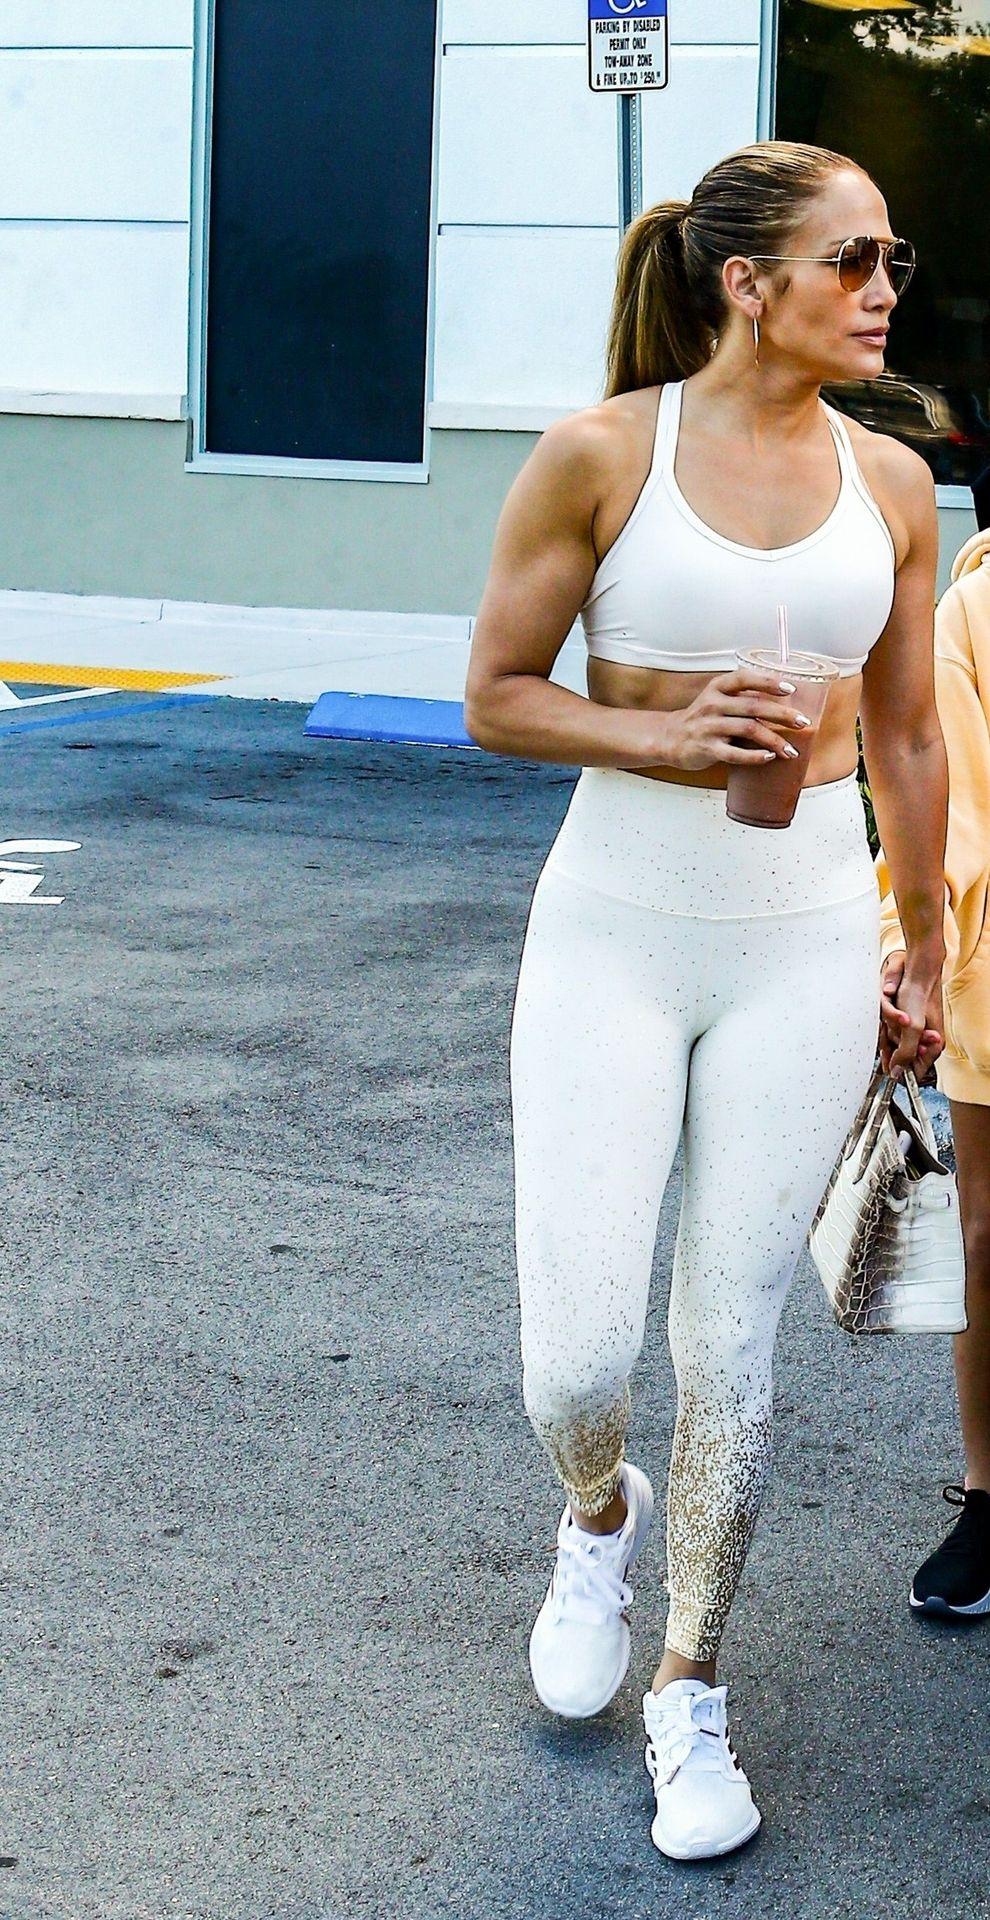 Jennifer Lopez Sexy Thefappeningblog Com 25 1